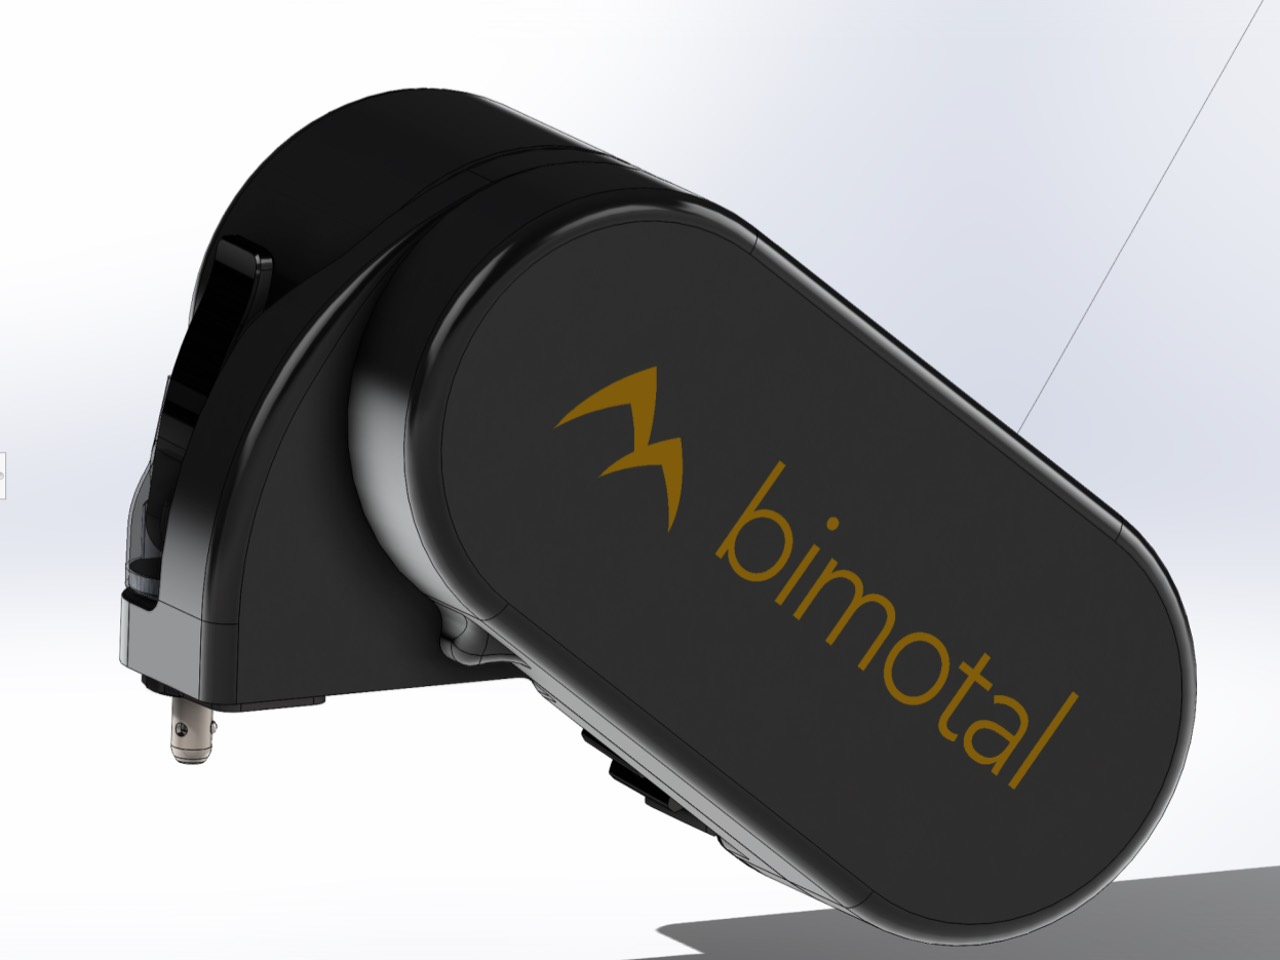 Bimotal Elevate drive unit